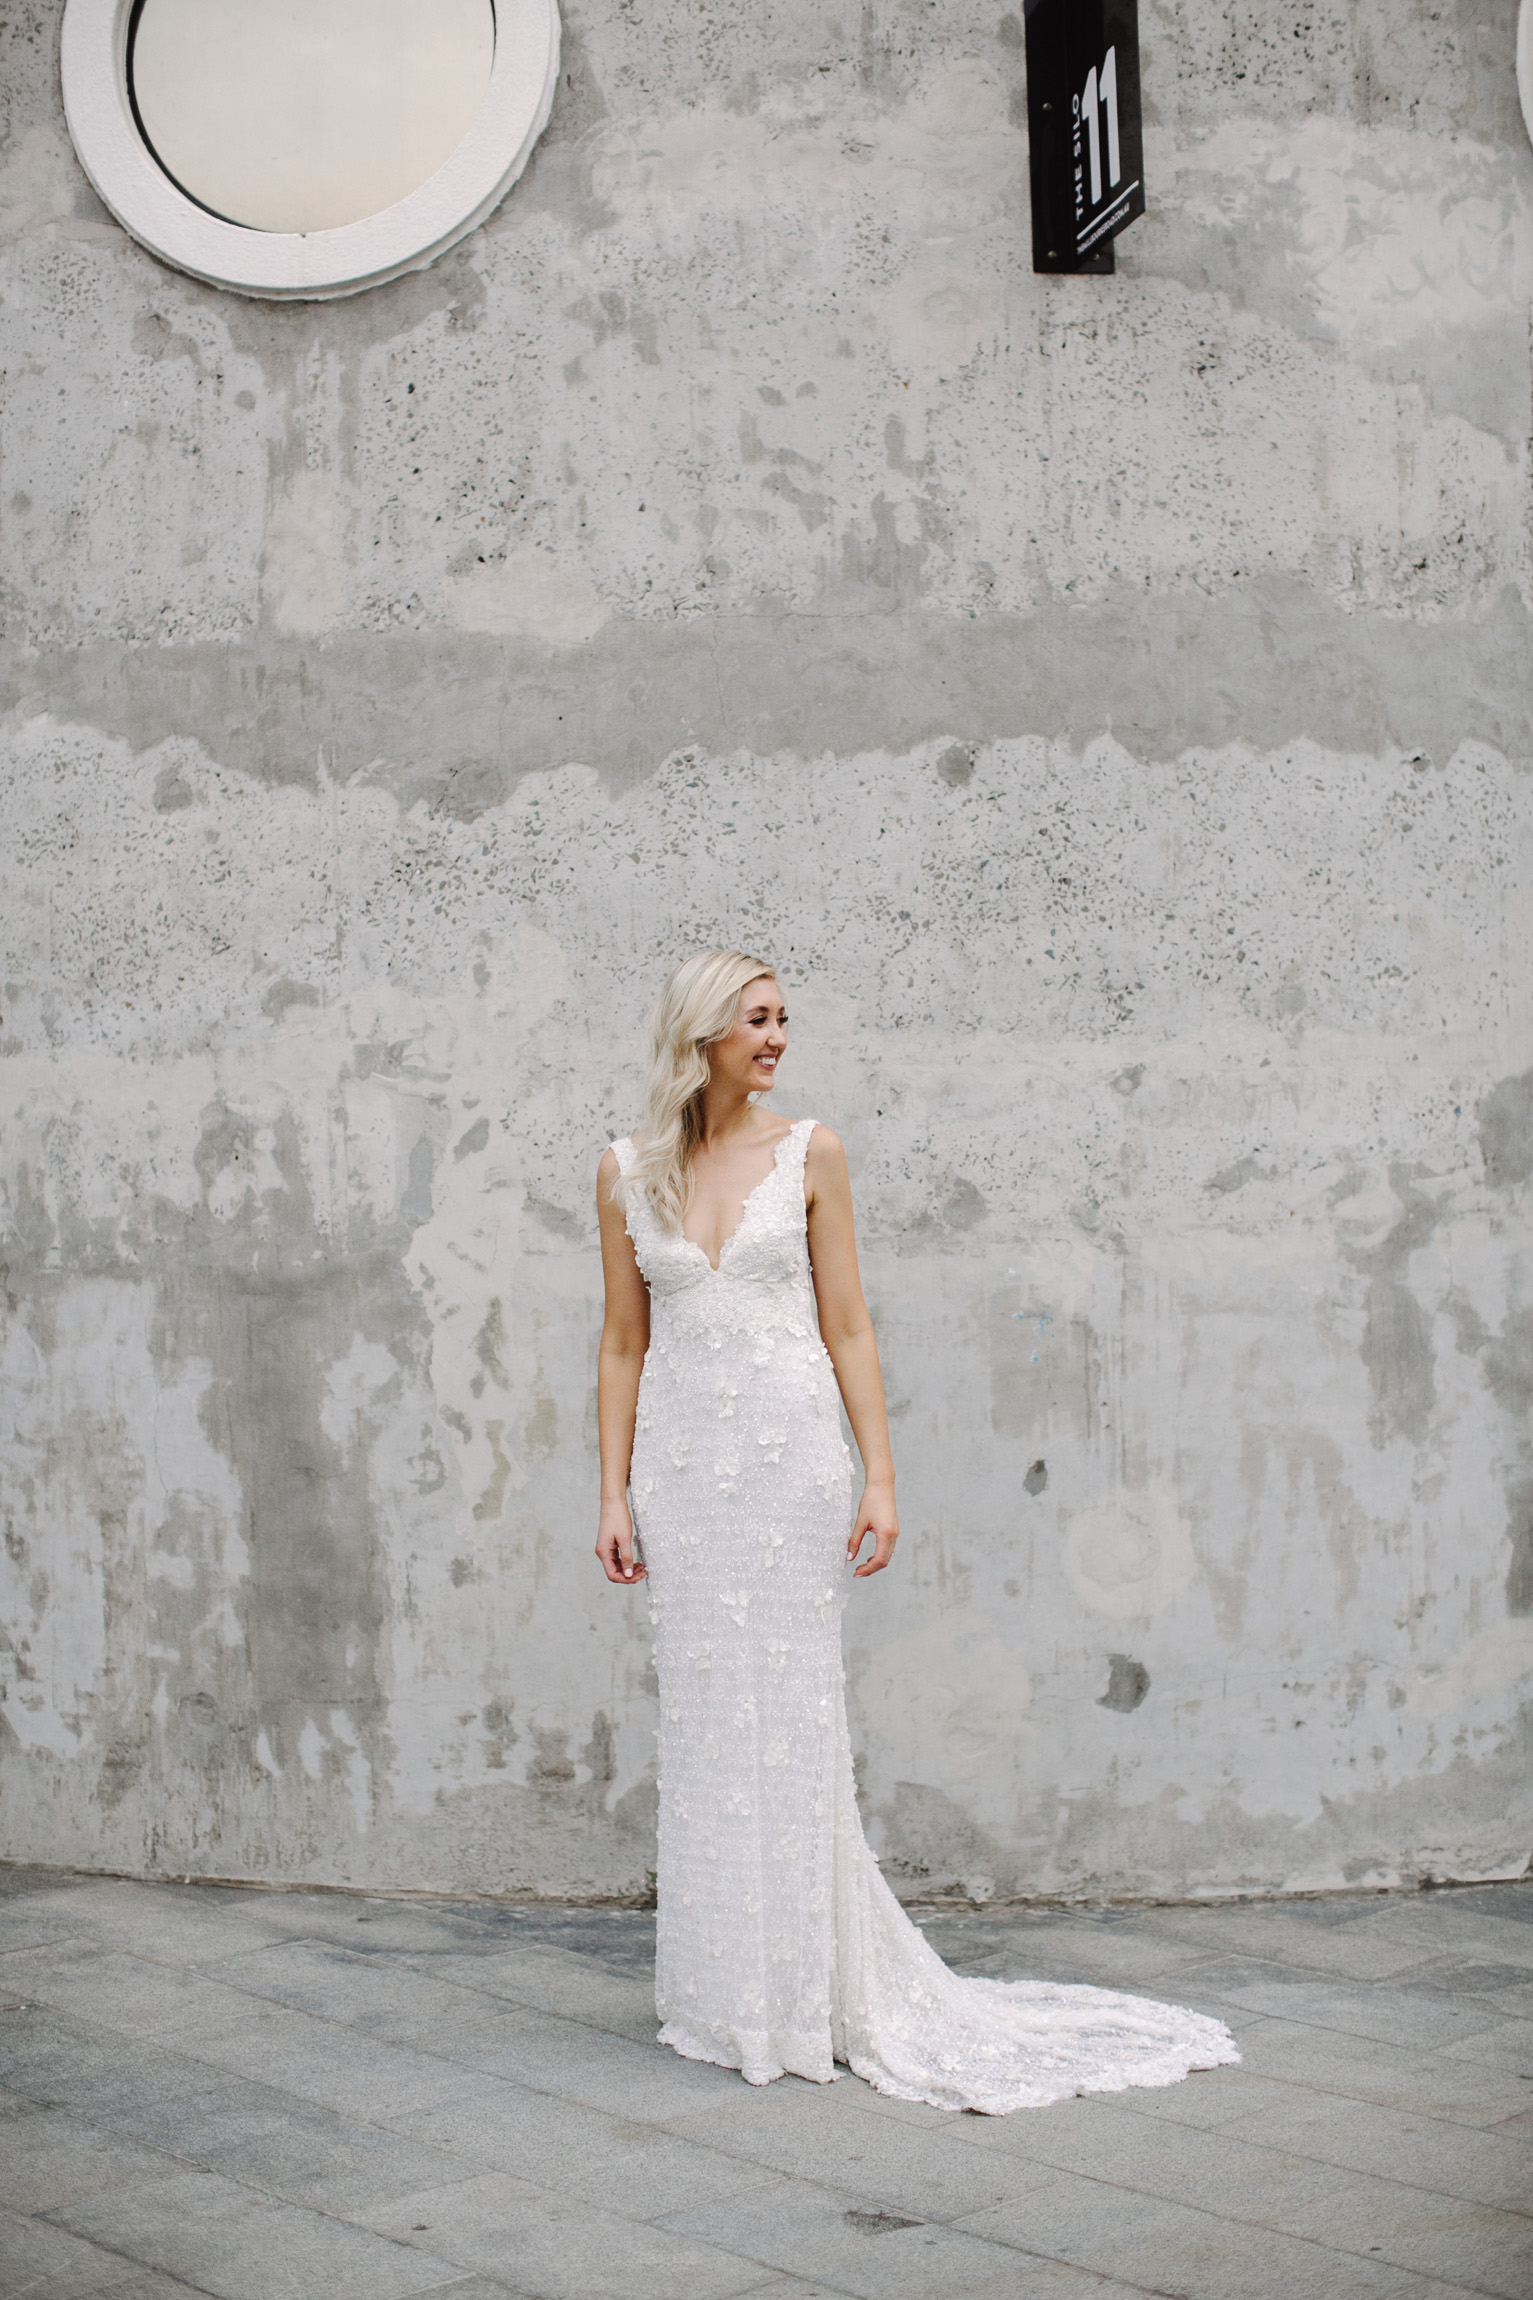 180223_justinaaron_wedding_charlotte_david_h-209.jpg